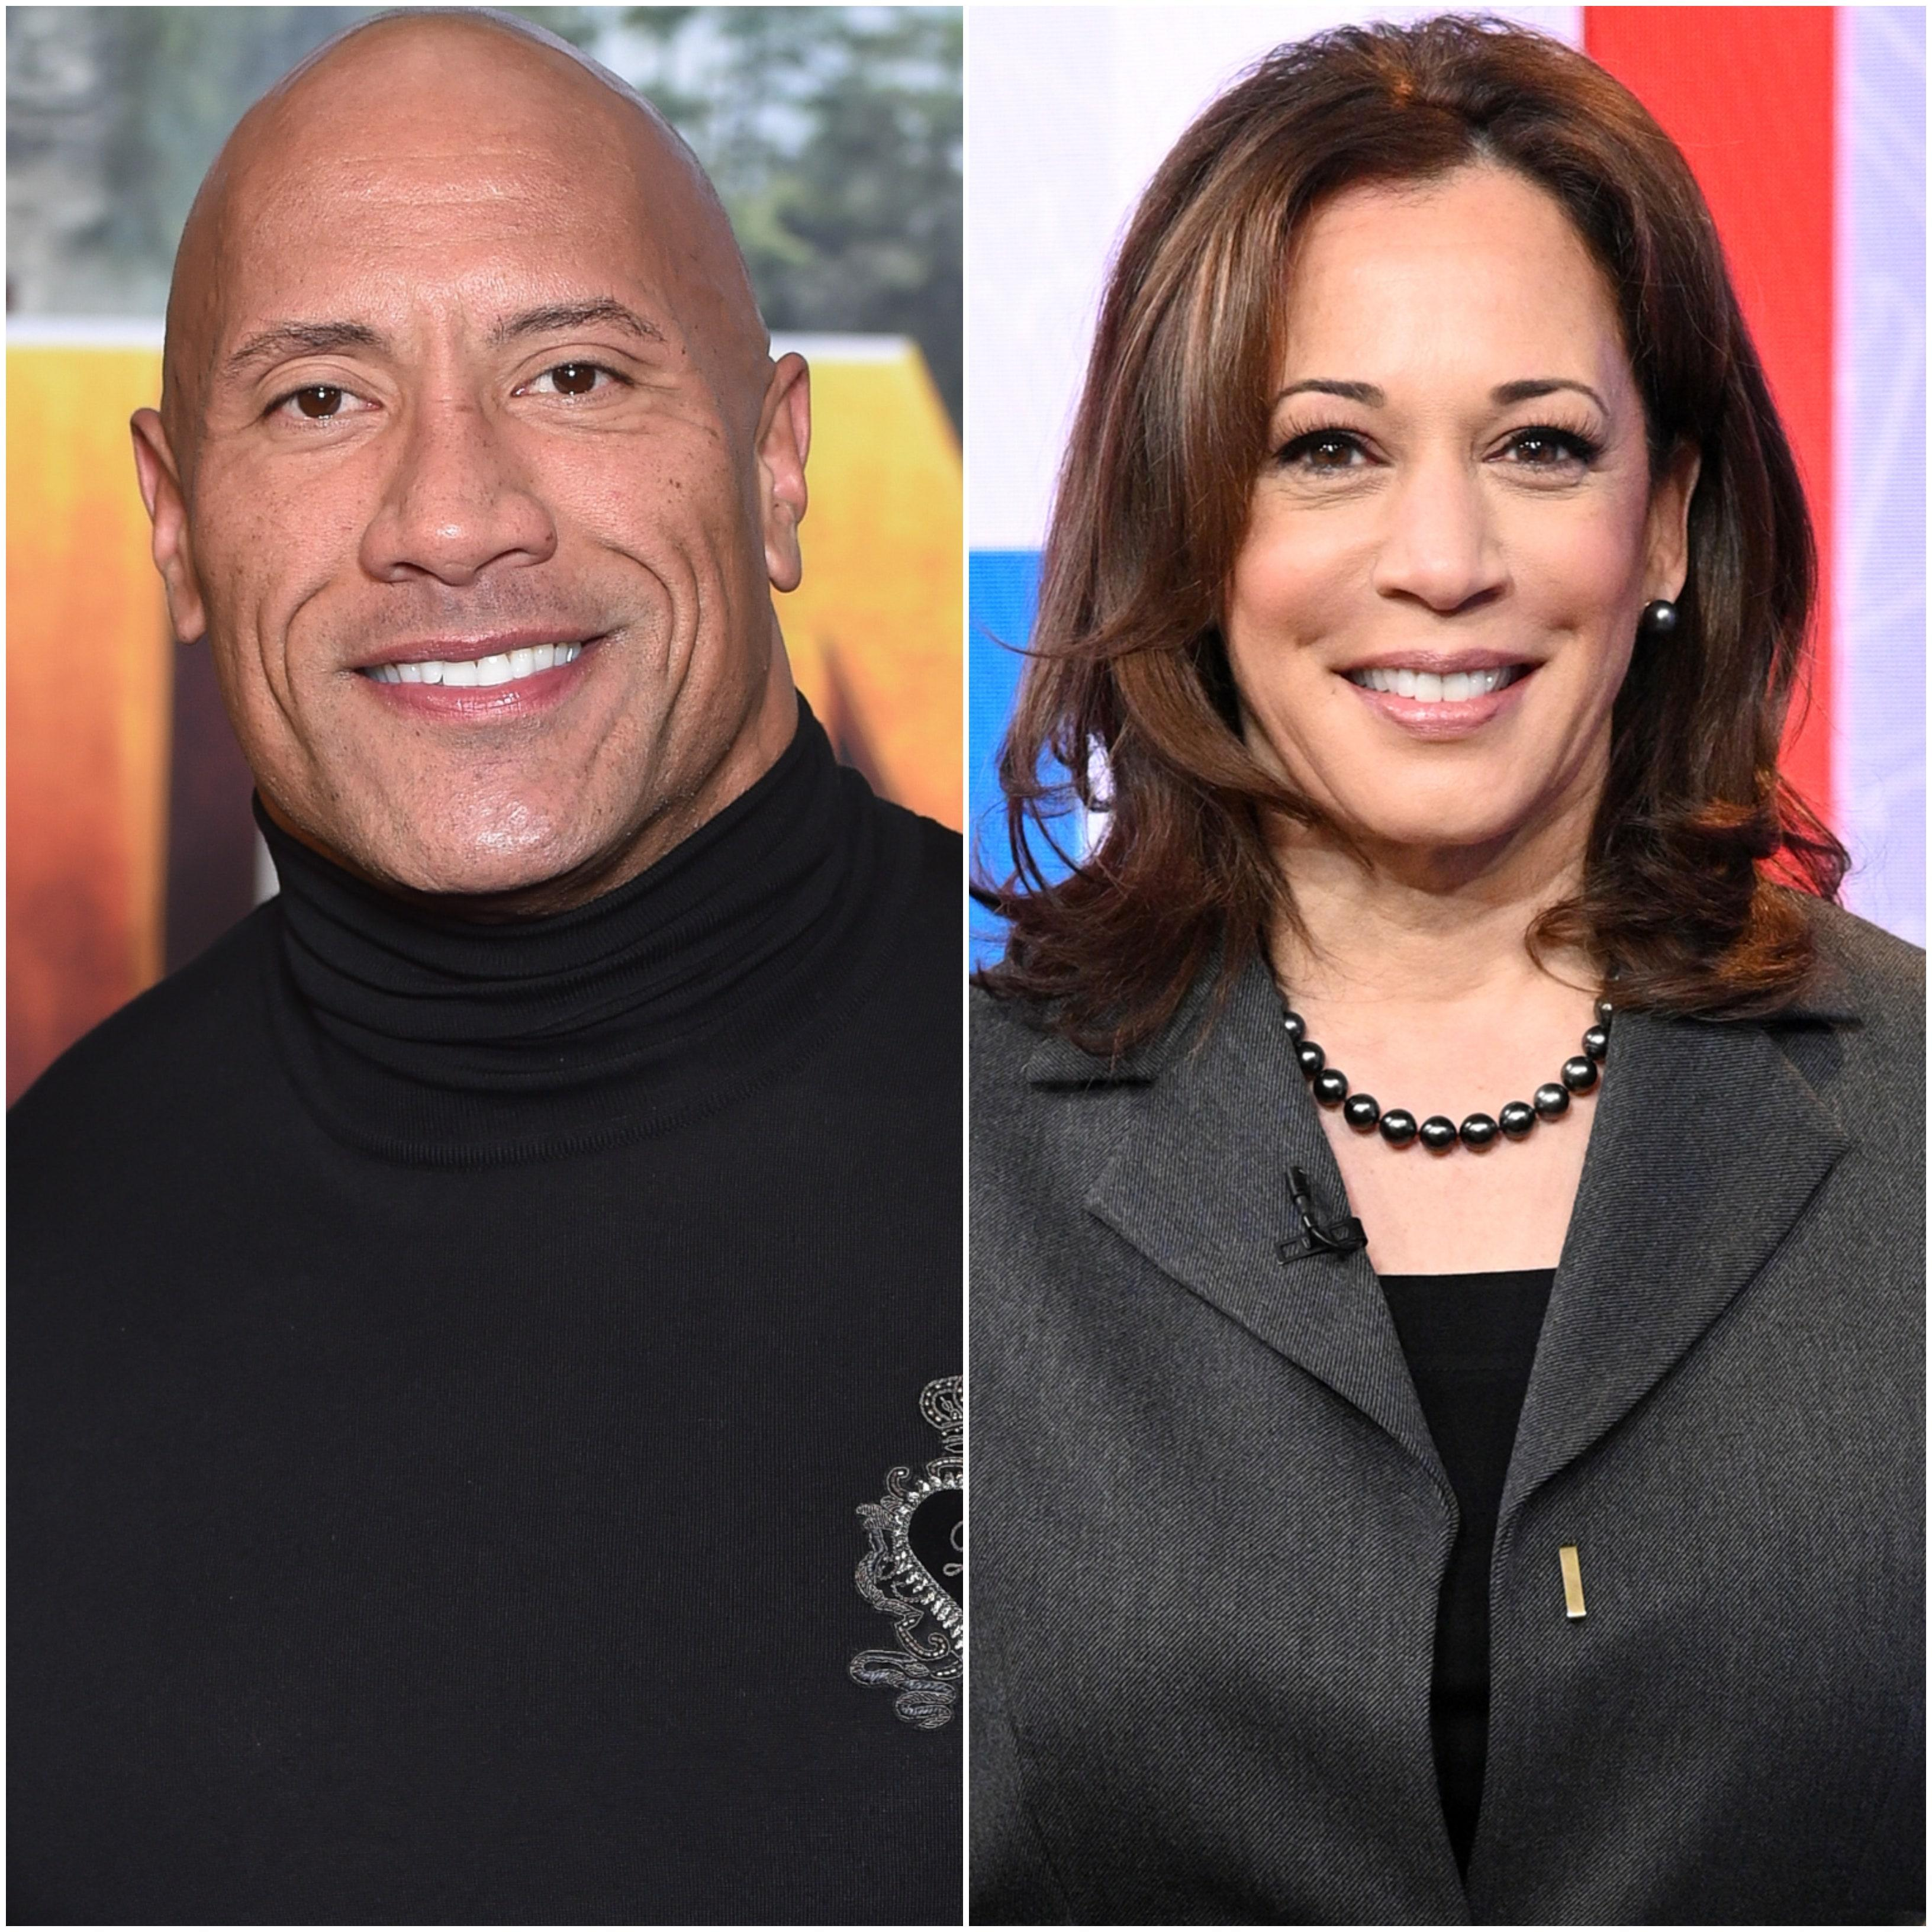 Dwayne 'The Rock' Johnson Endorses Joe Biden and 'Certified Badass' Kamala Harris